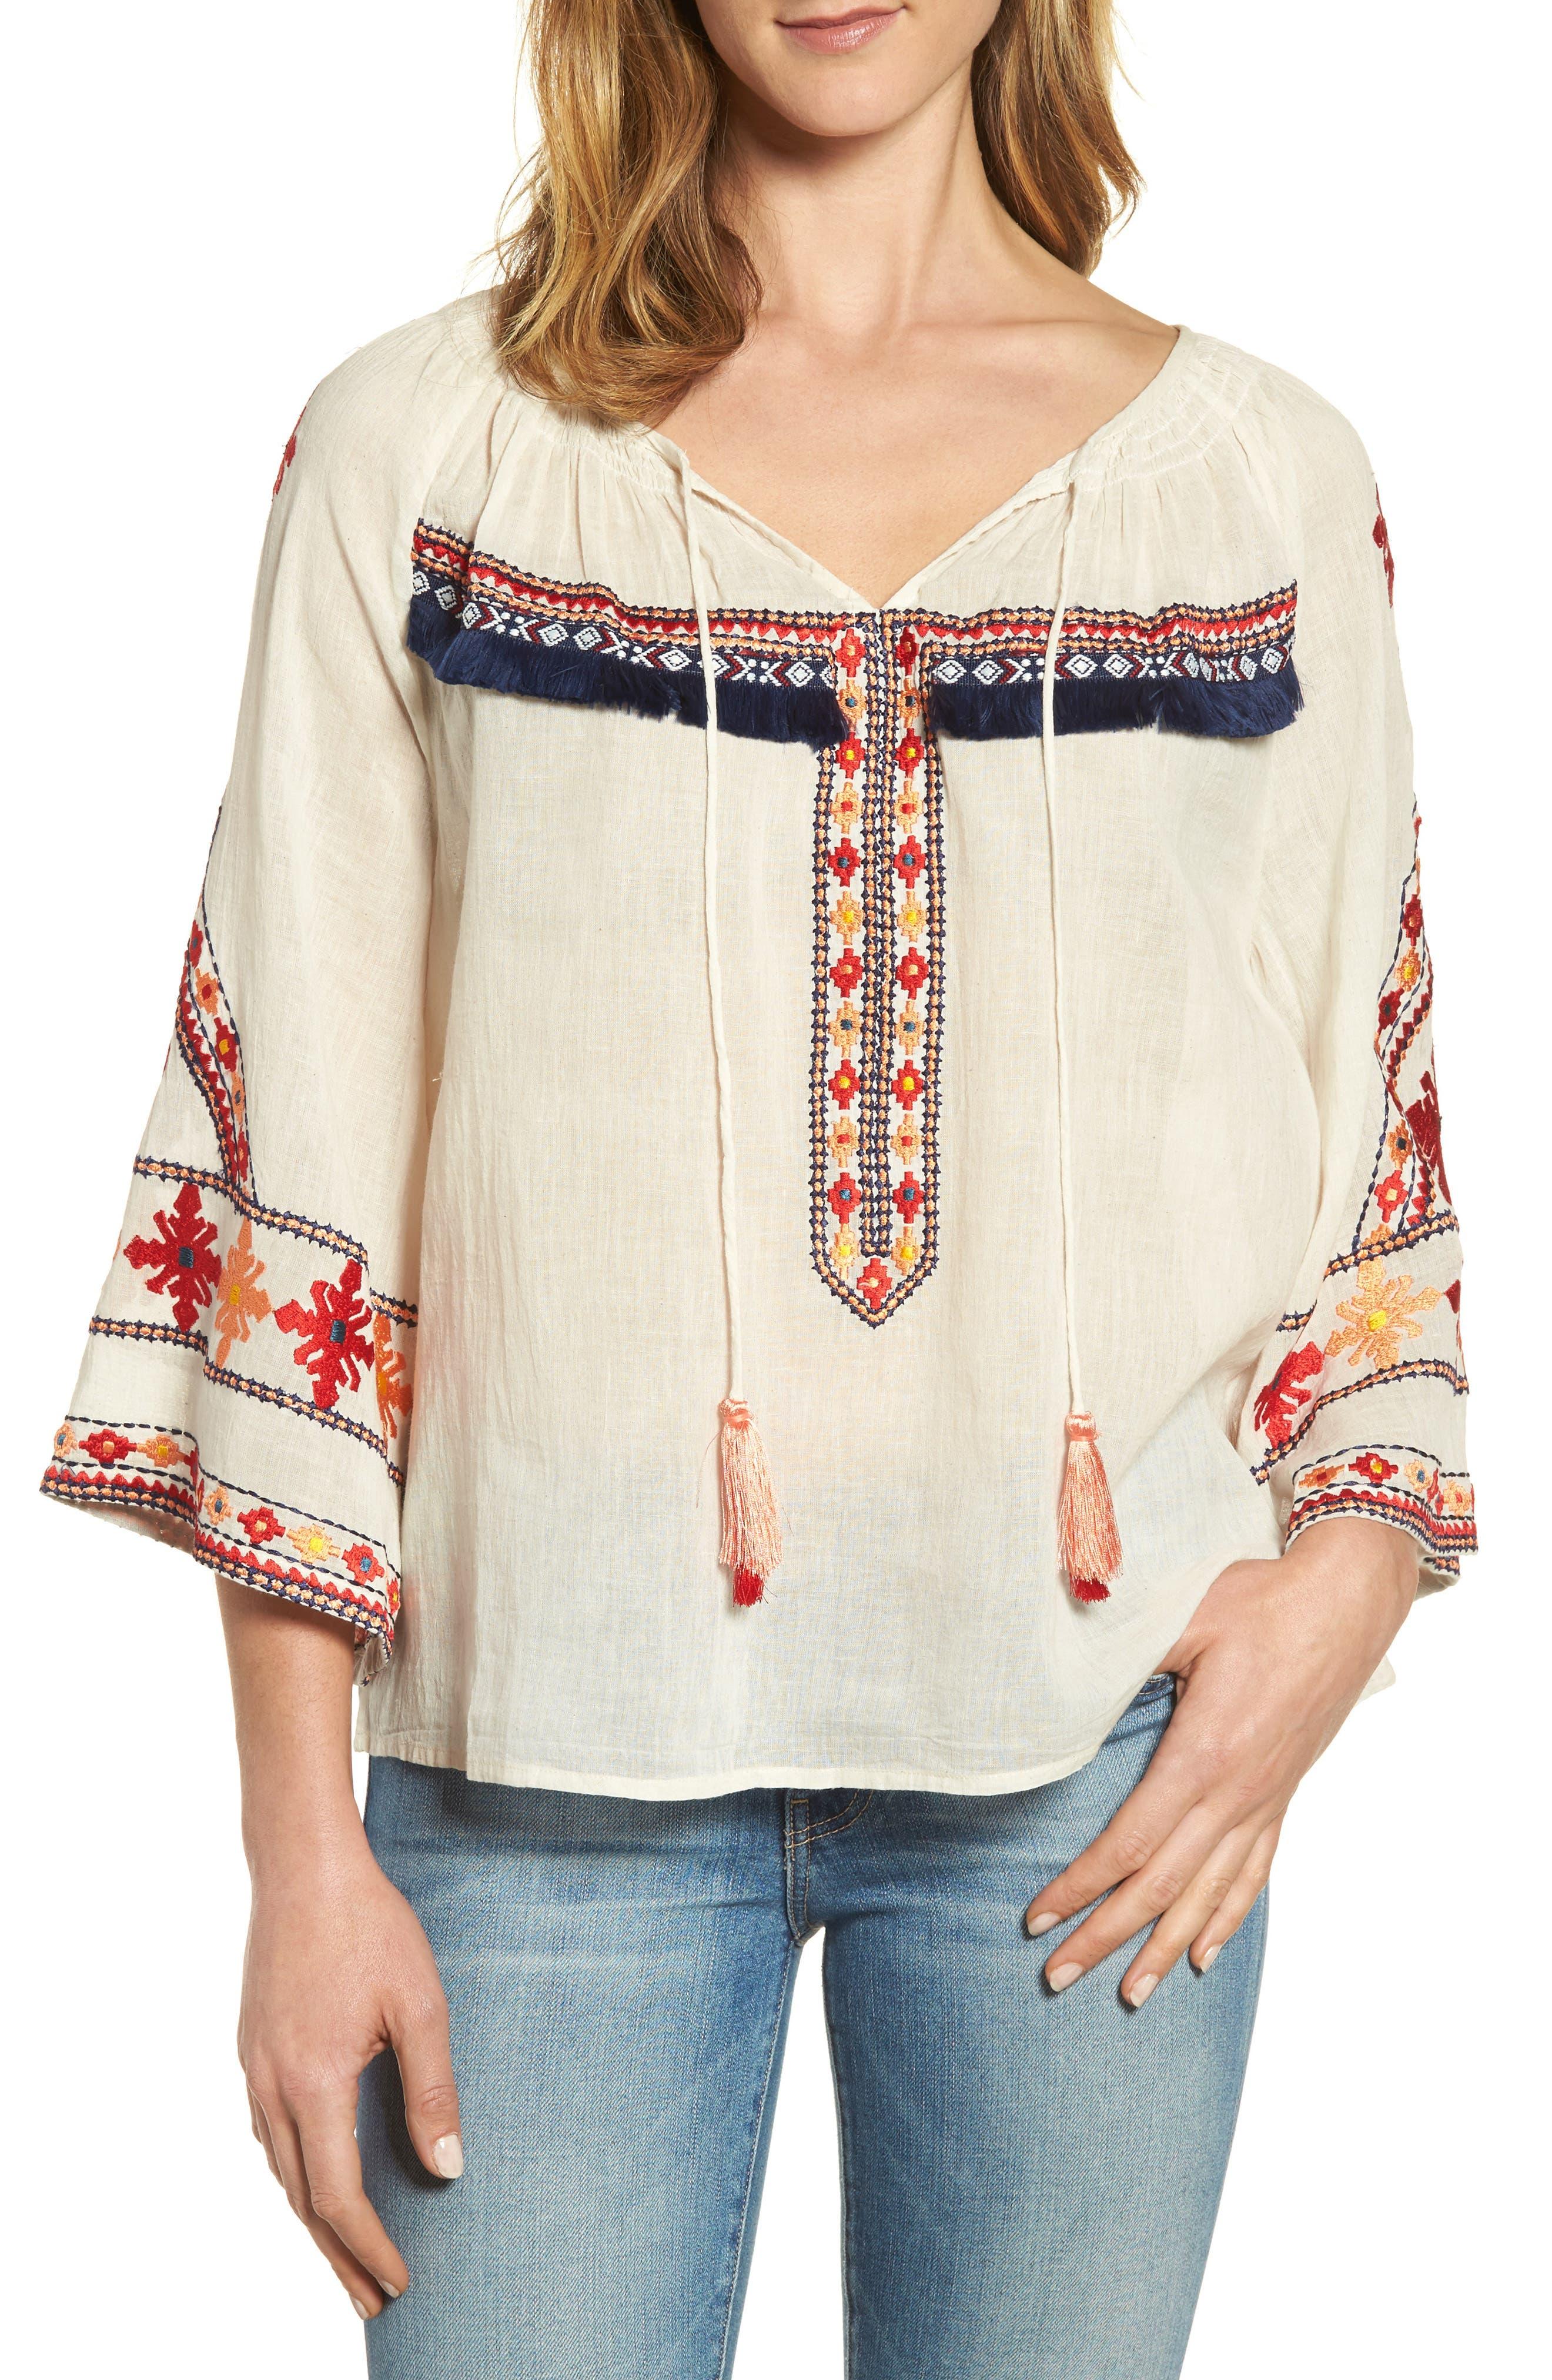 Main Image - KAS NEW YORK Juana Embroidered Peasant Top